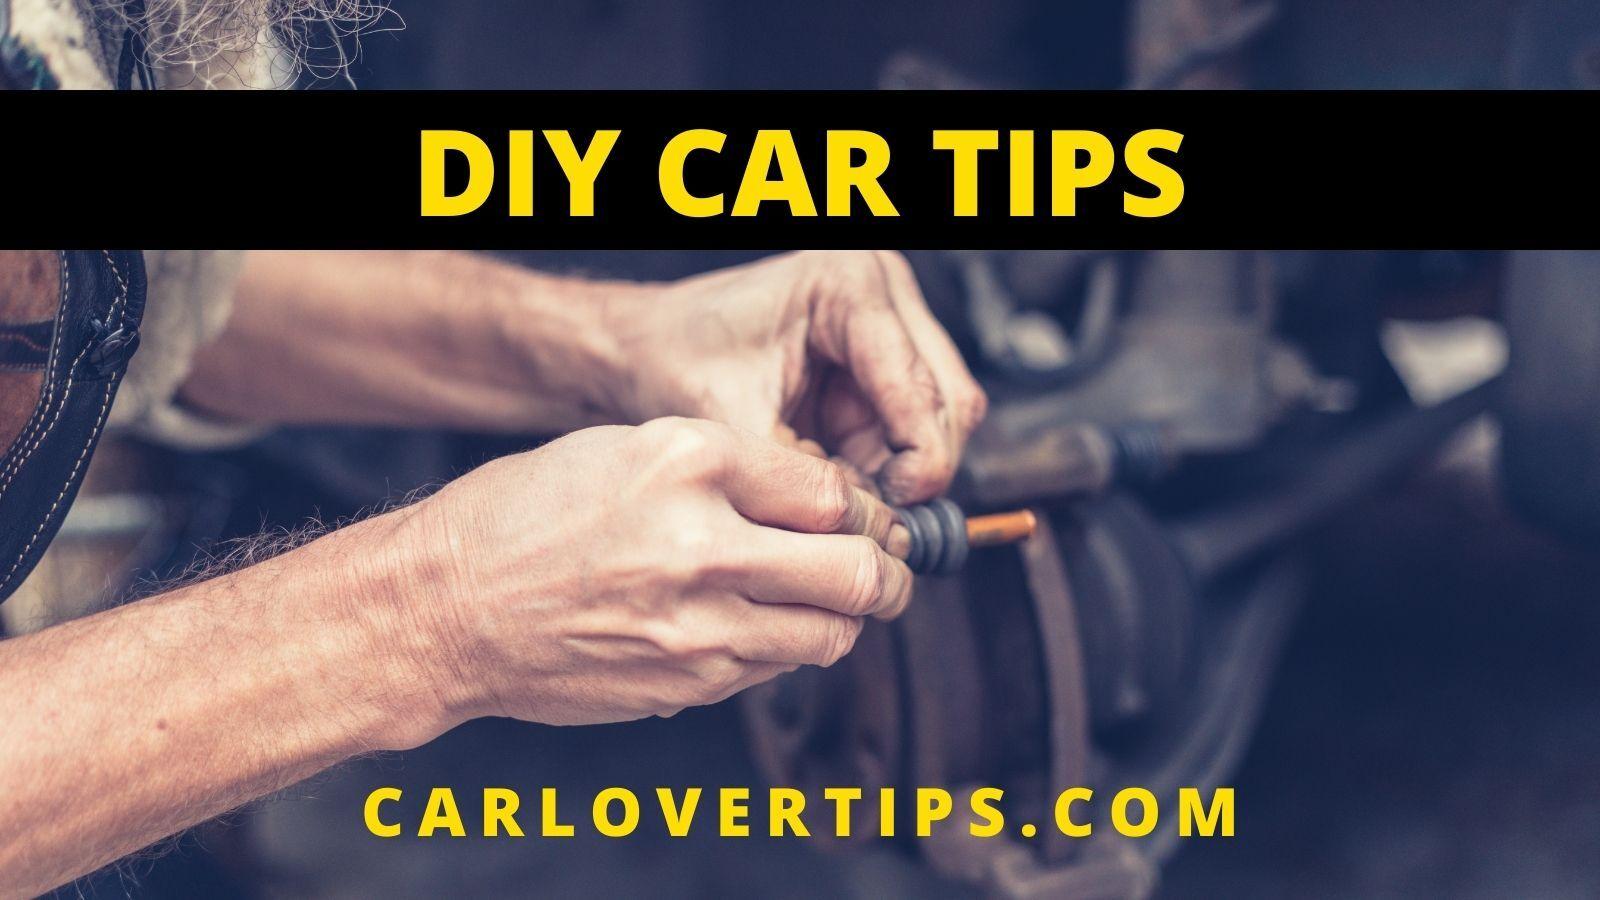 DIY Car Tips Car Lover Tips